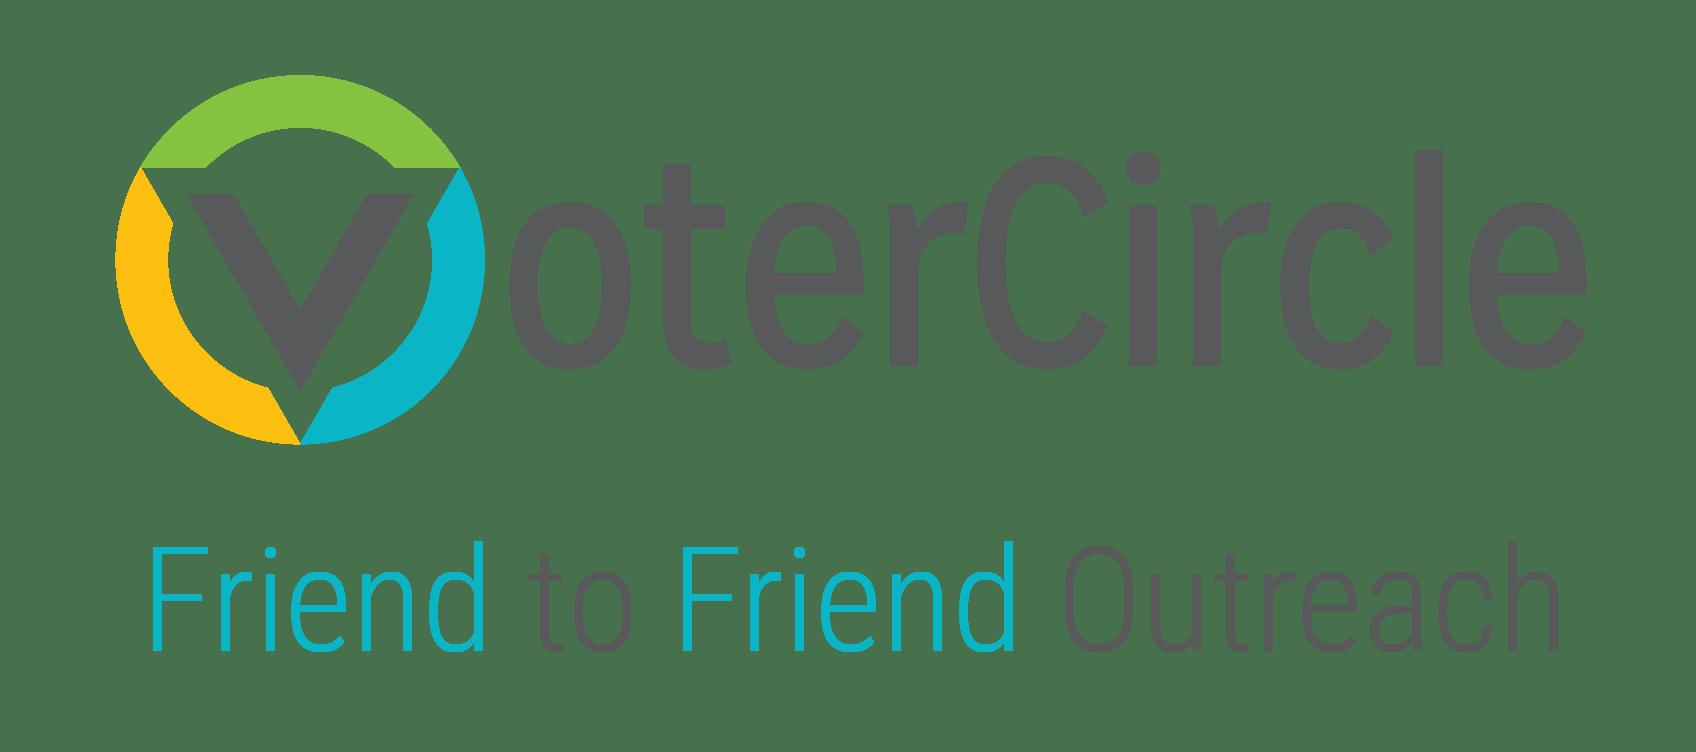 VoterCircle company logo